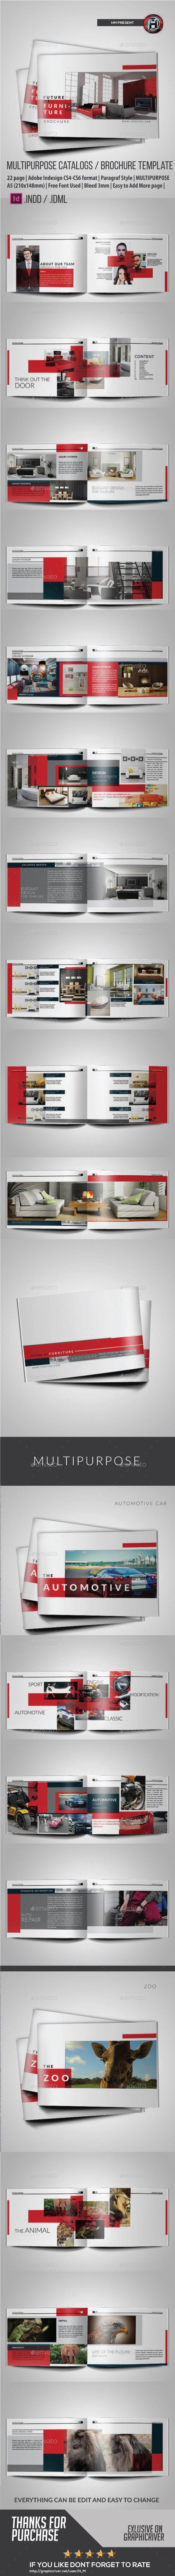 FUTURE MODERN CATALOG OR PORTOFOLIO DESIGN - Catalogs Brochures